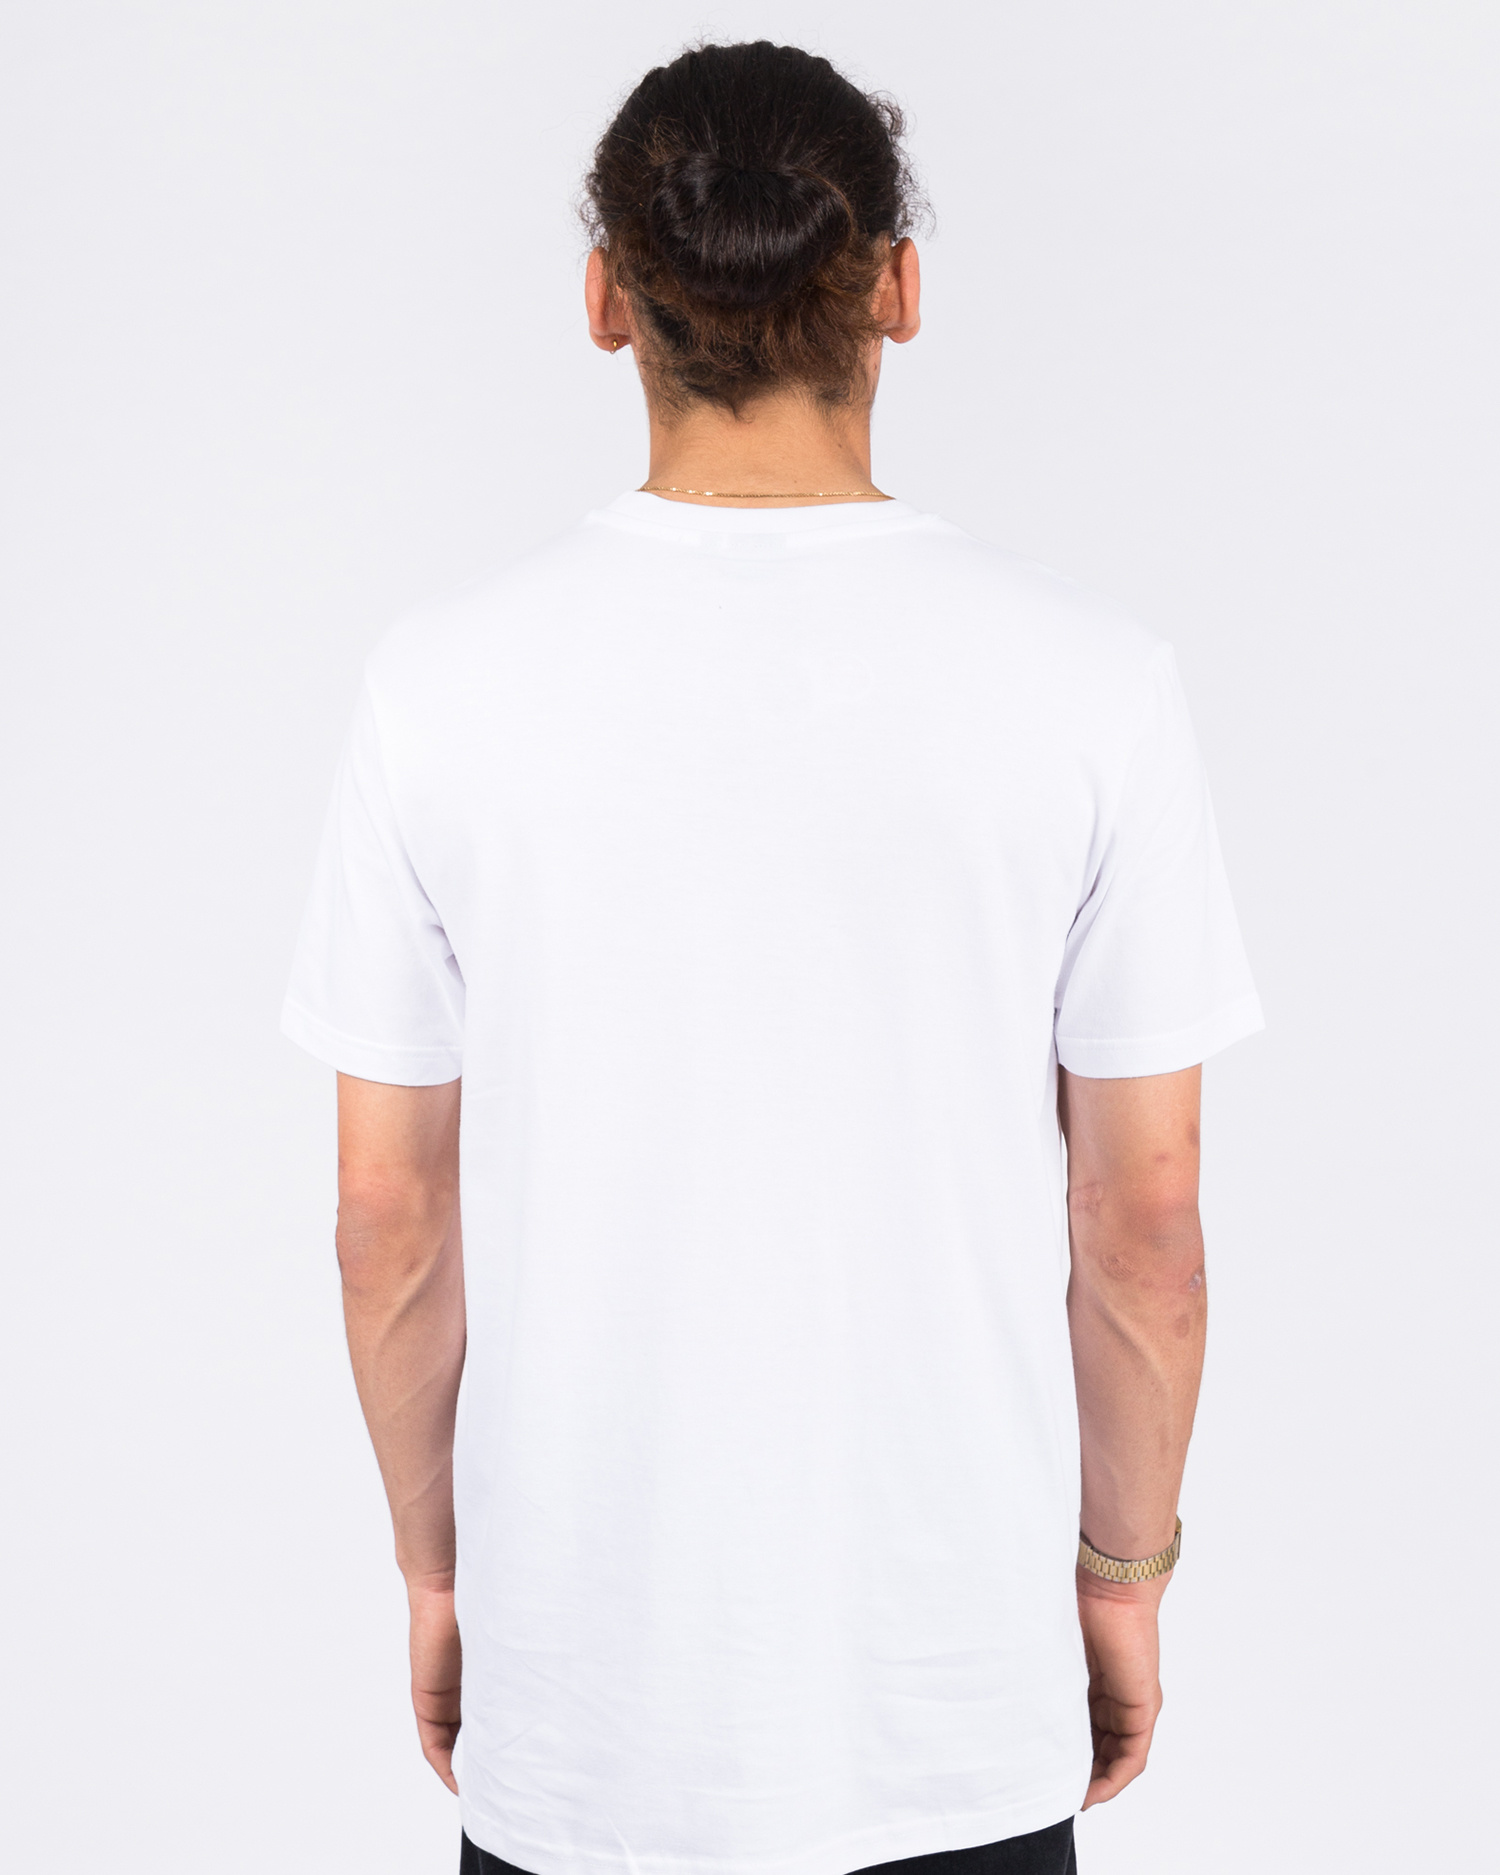 Ben G BKNY T-Shirt White